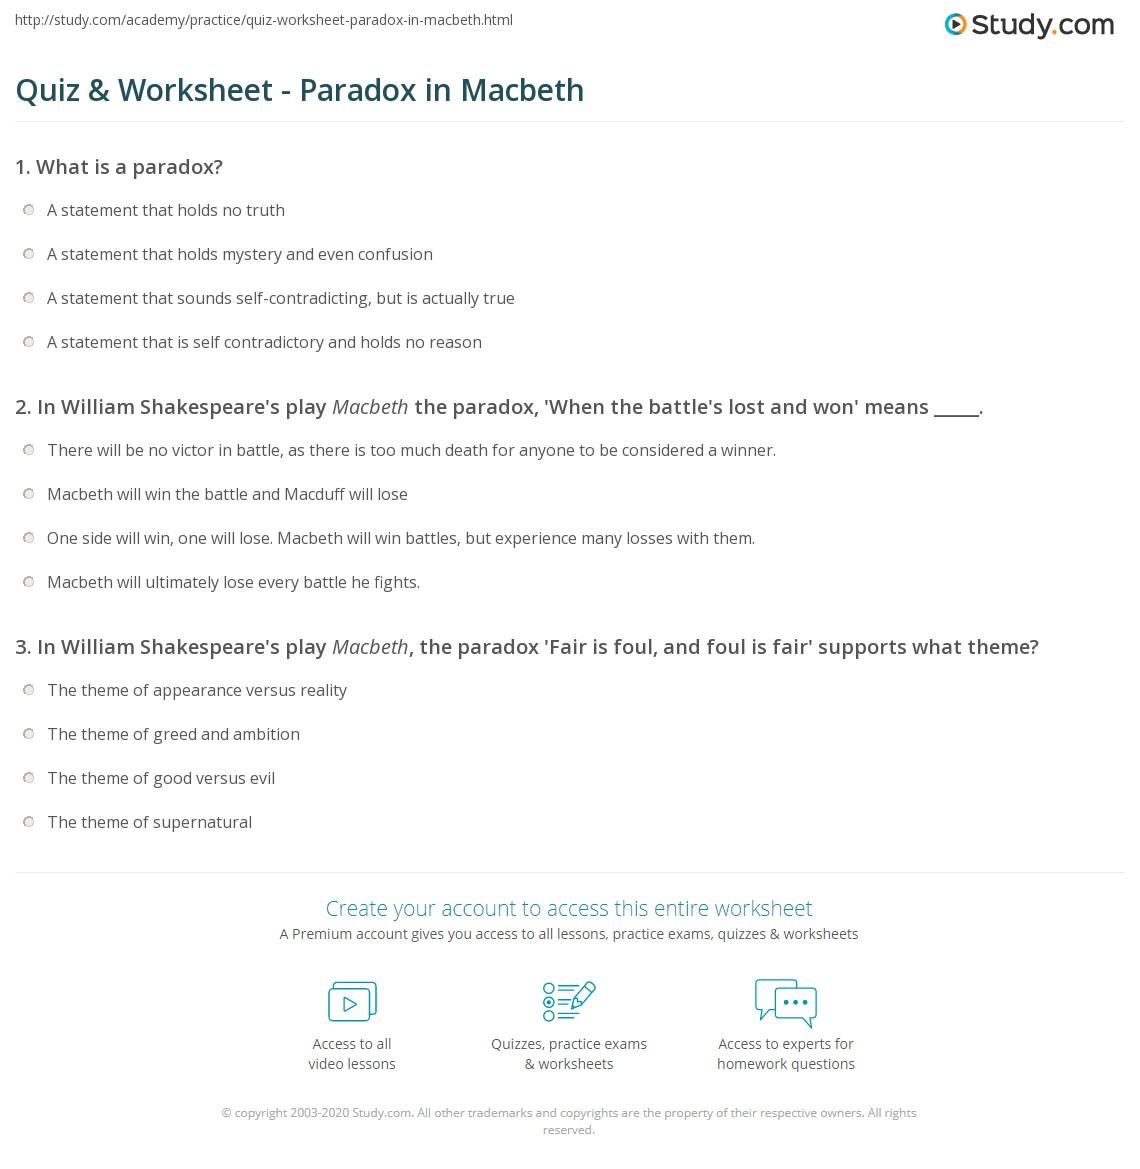 Quiz Worksheet Paradox In Macbeth Study